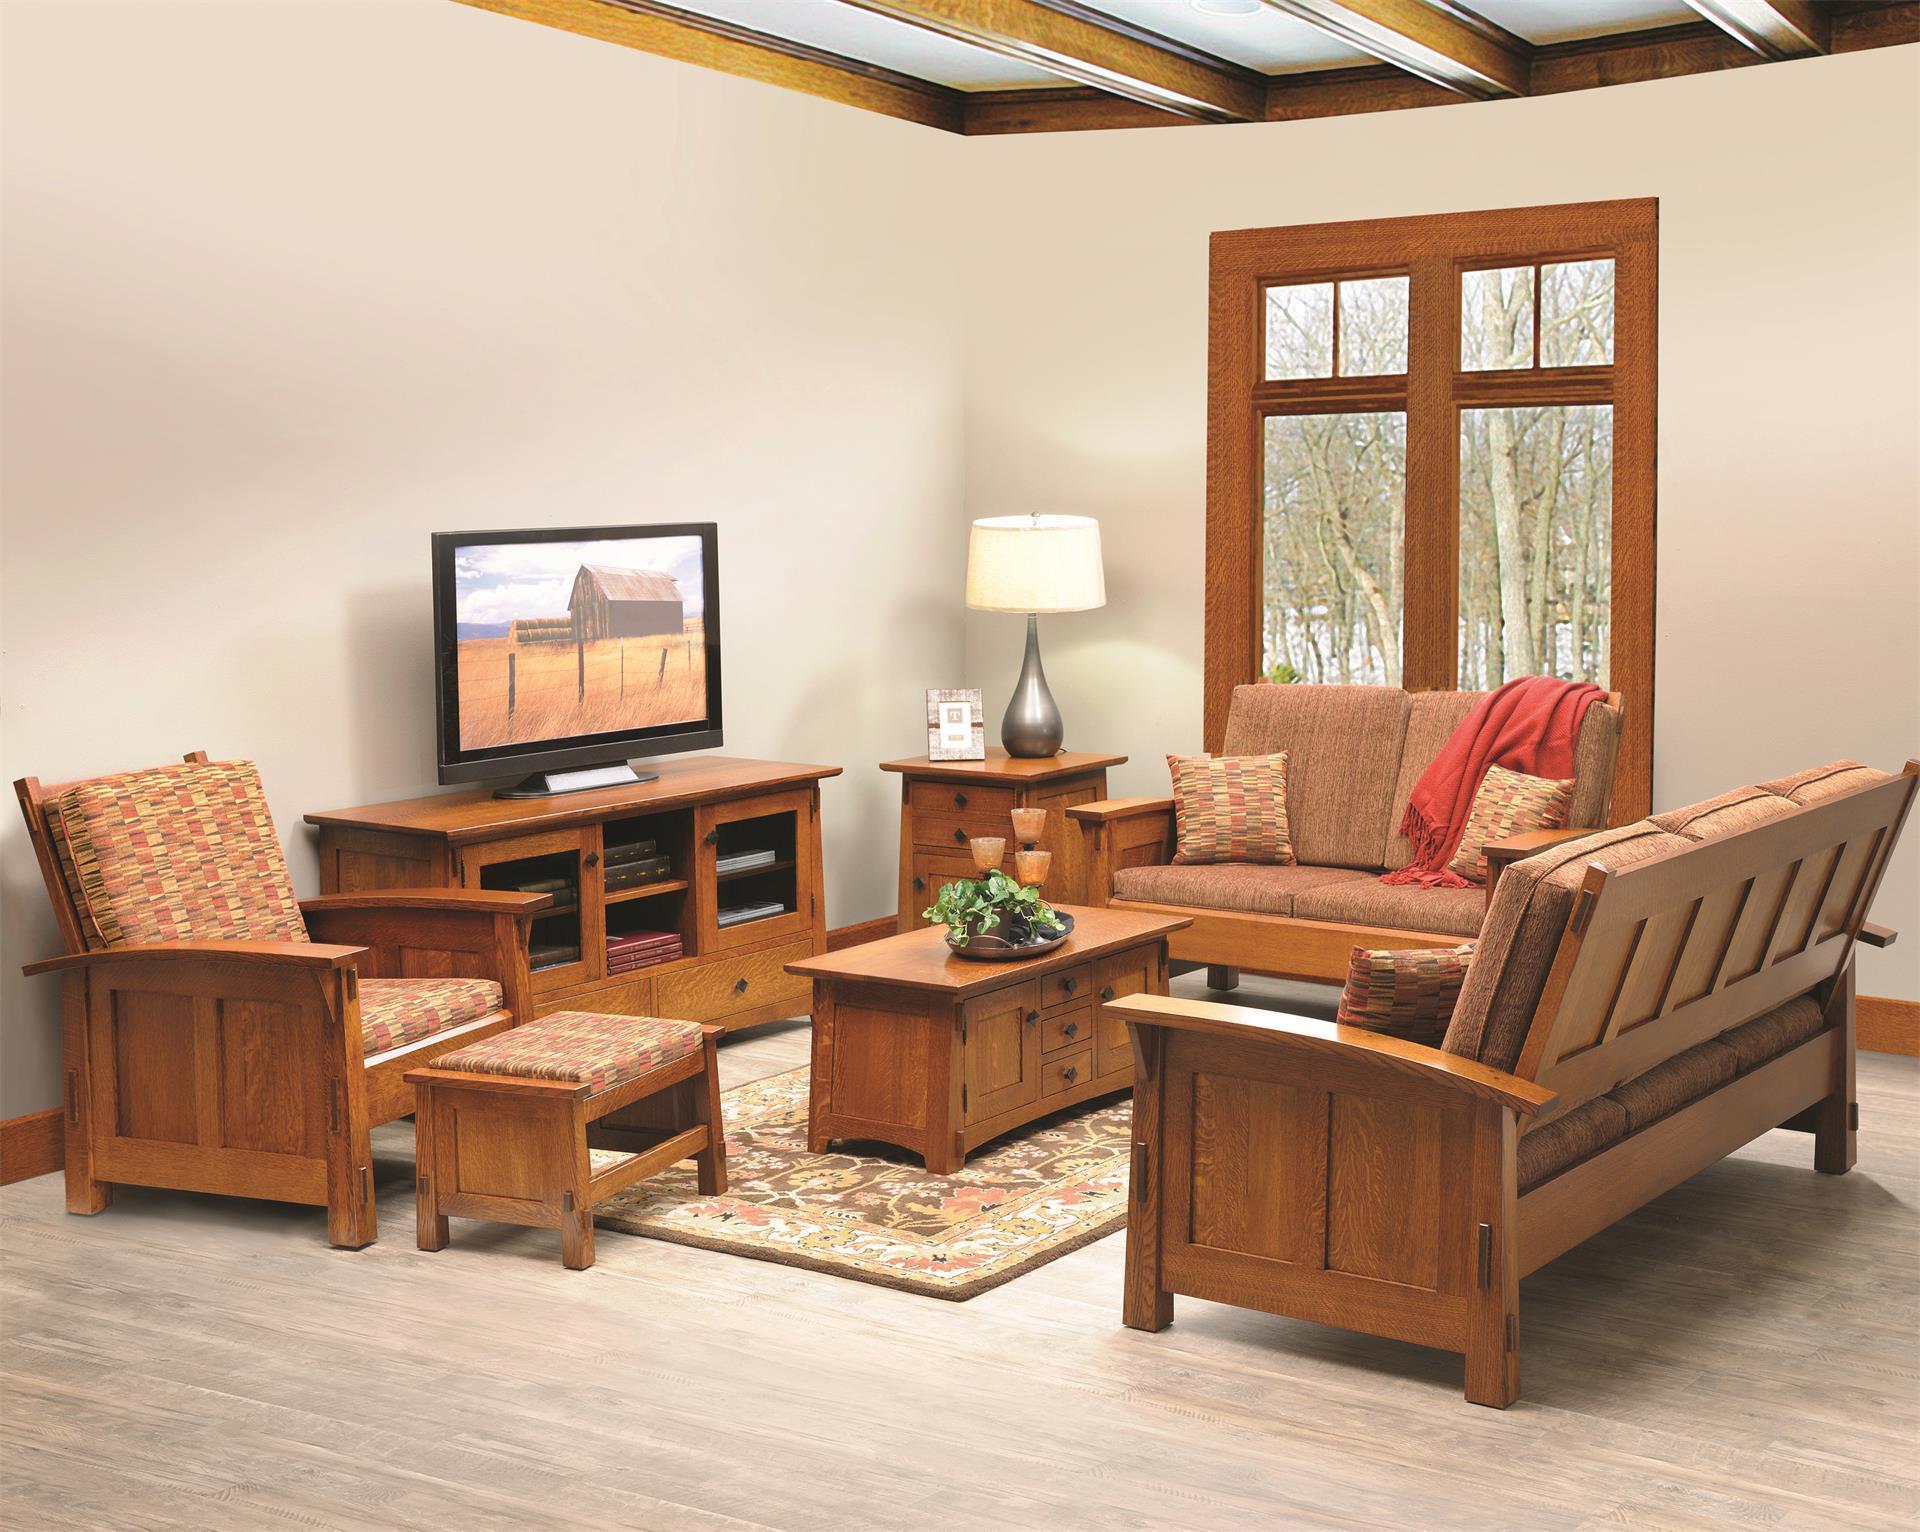 Shop The Look Goshen Shaker Living Room Set